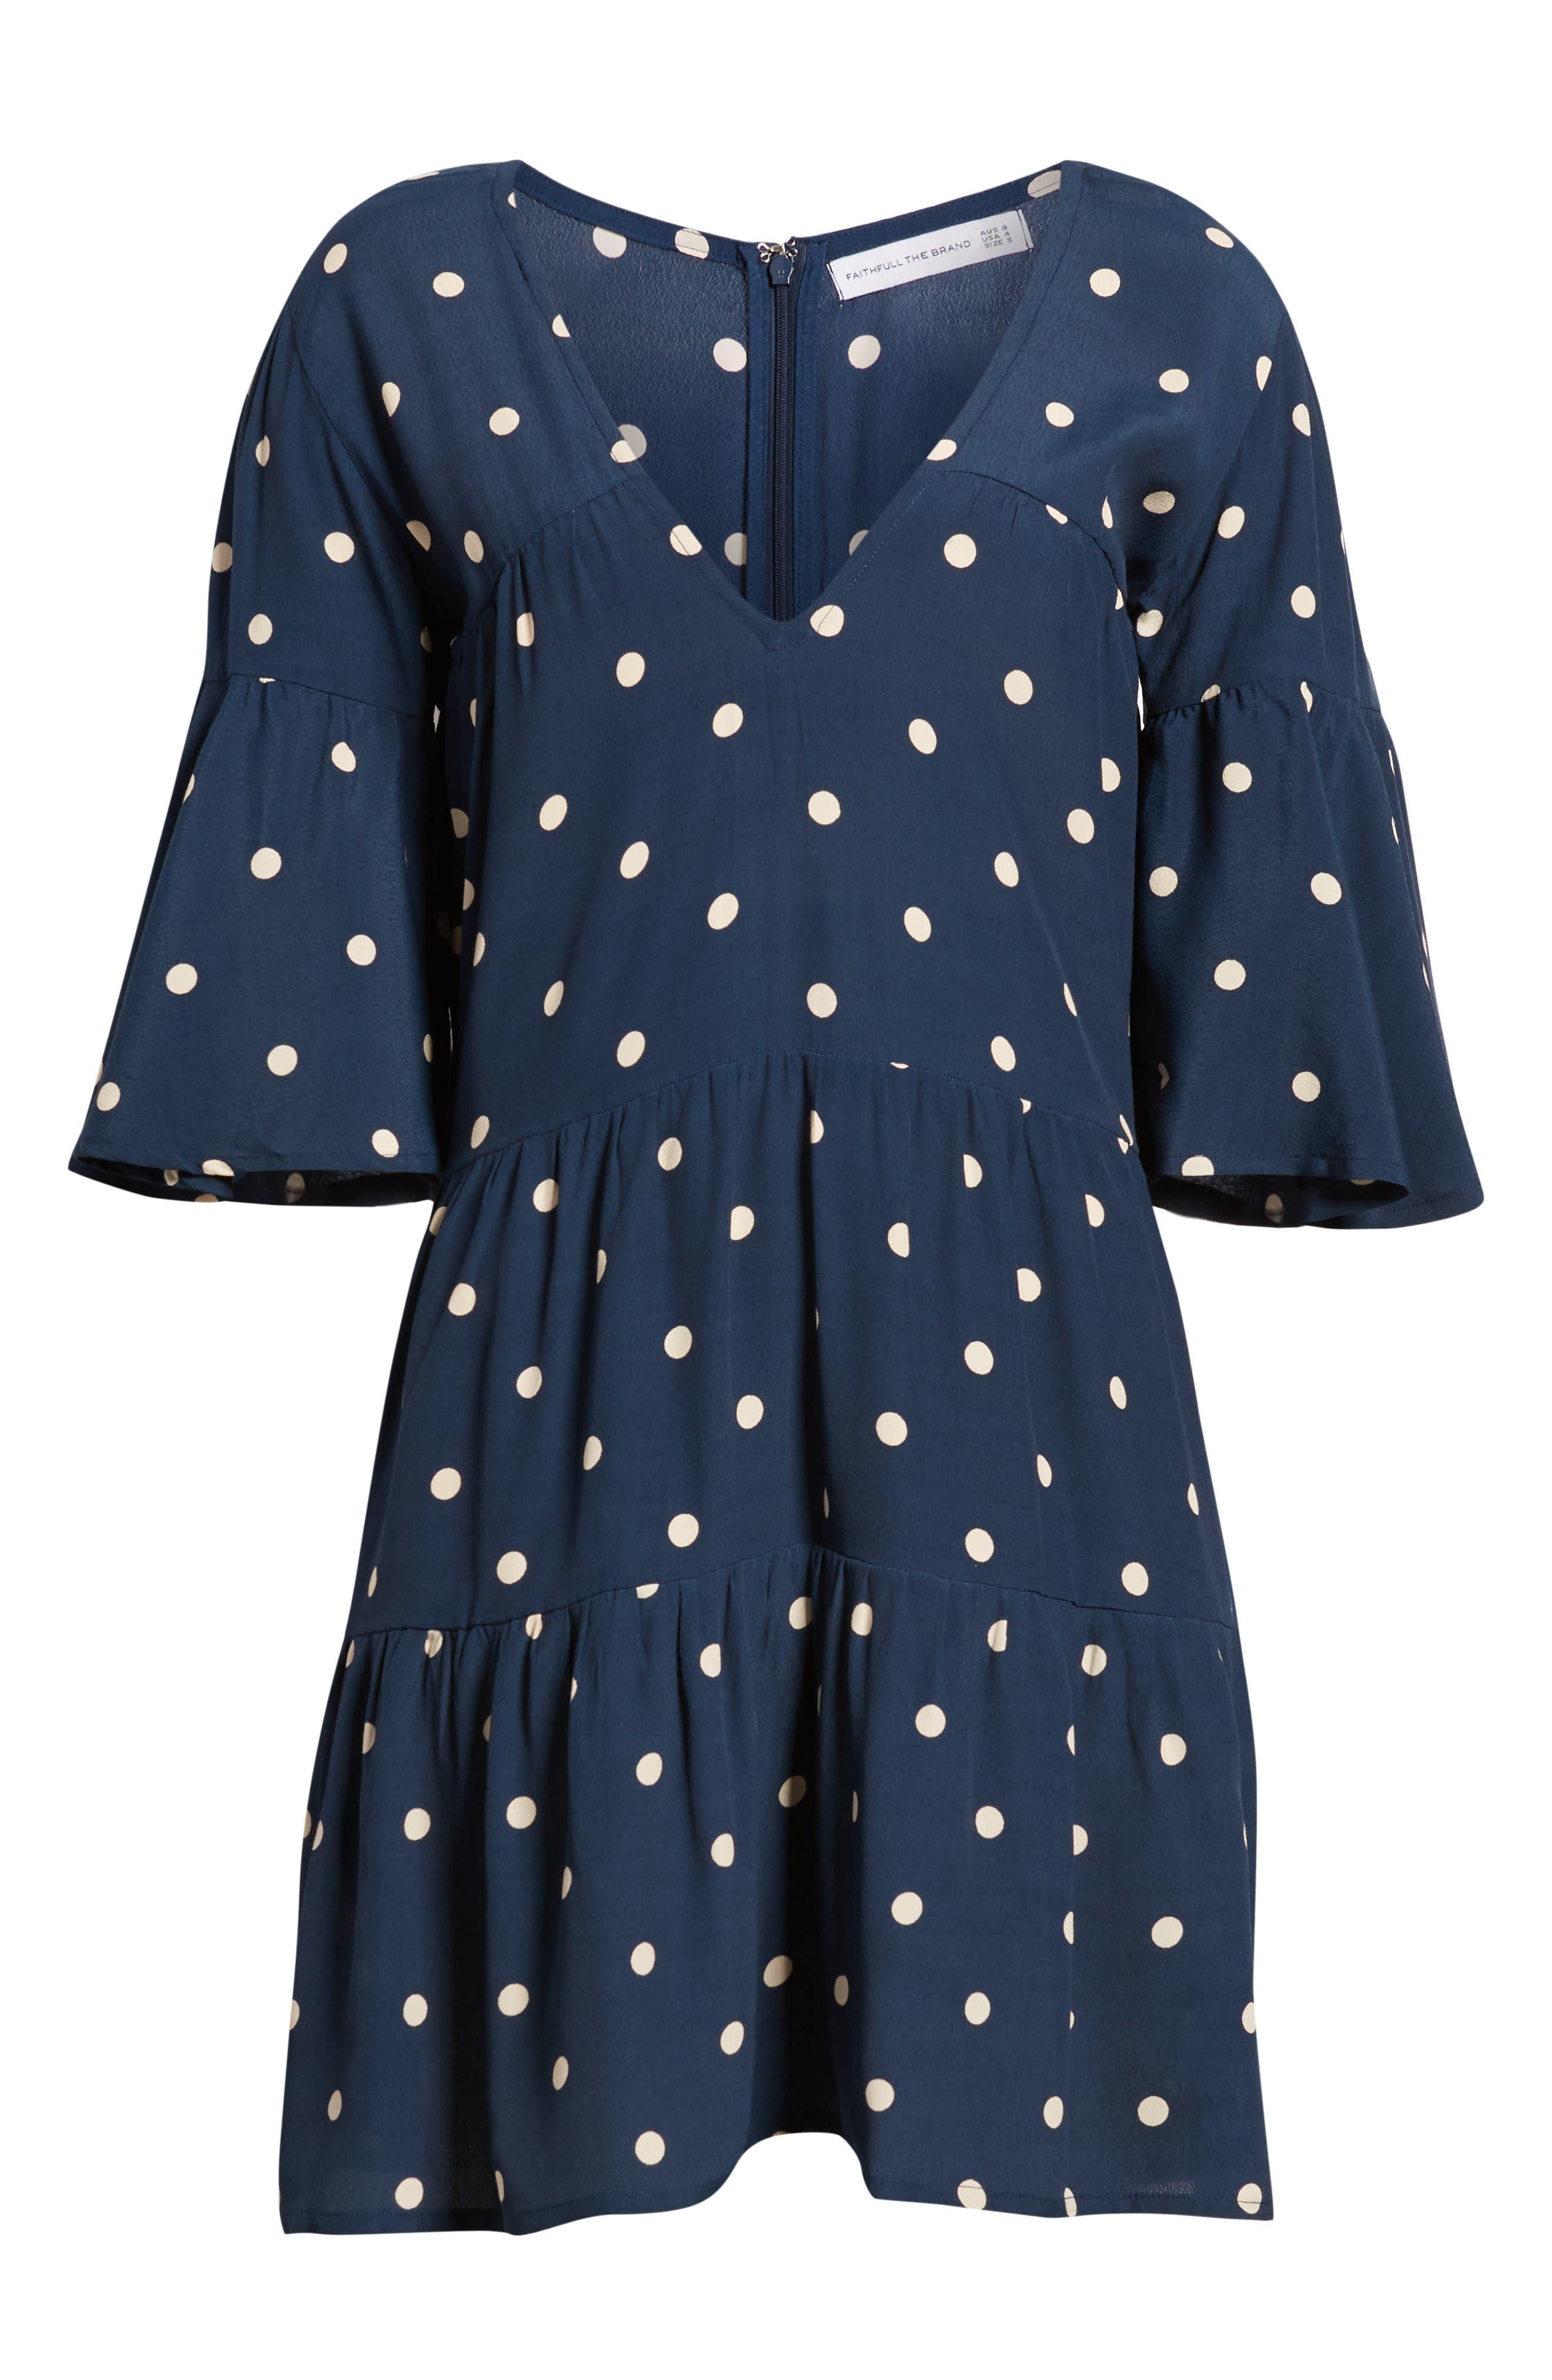 Polka Dot Dress,                             Alternate thumbnail 4, color,                             RONJA DOT VINTAGE BLUE